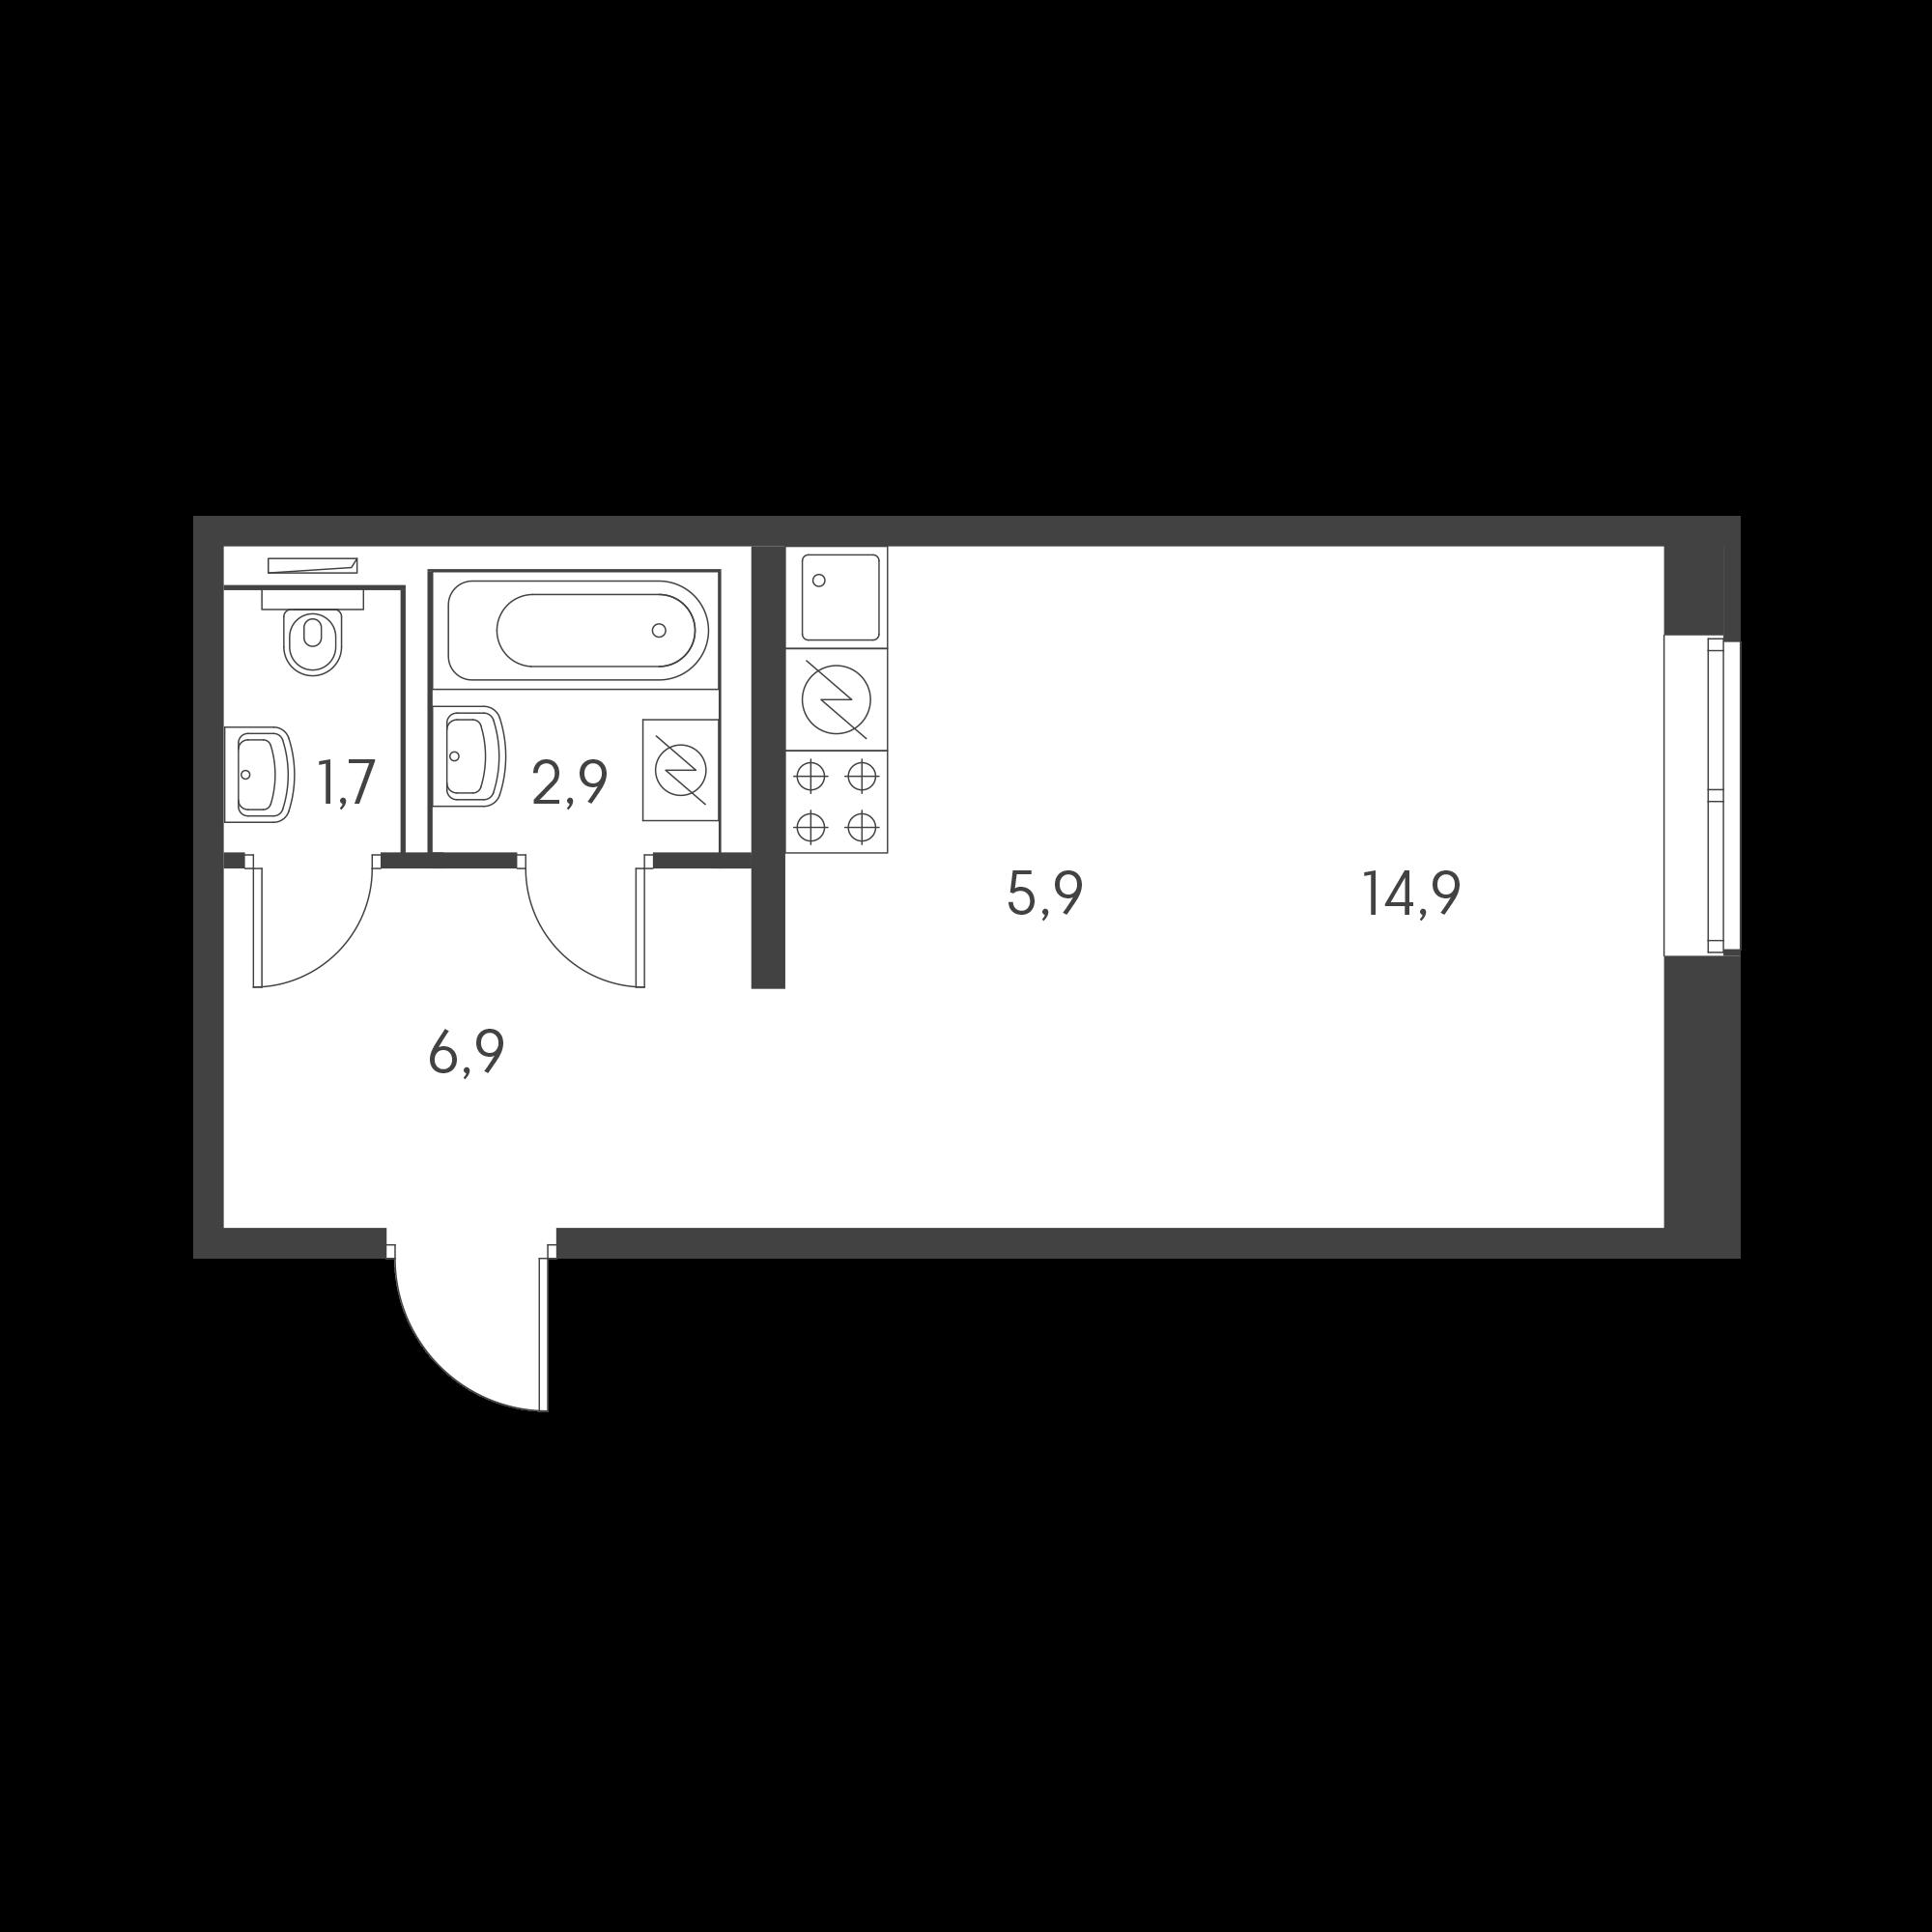 1NL21_8.4-1(1)